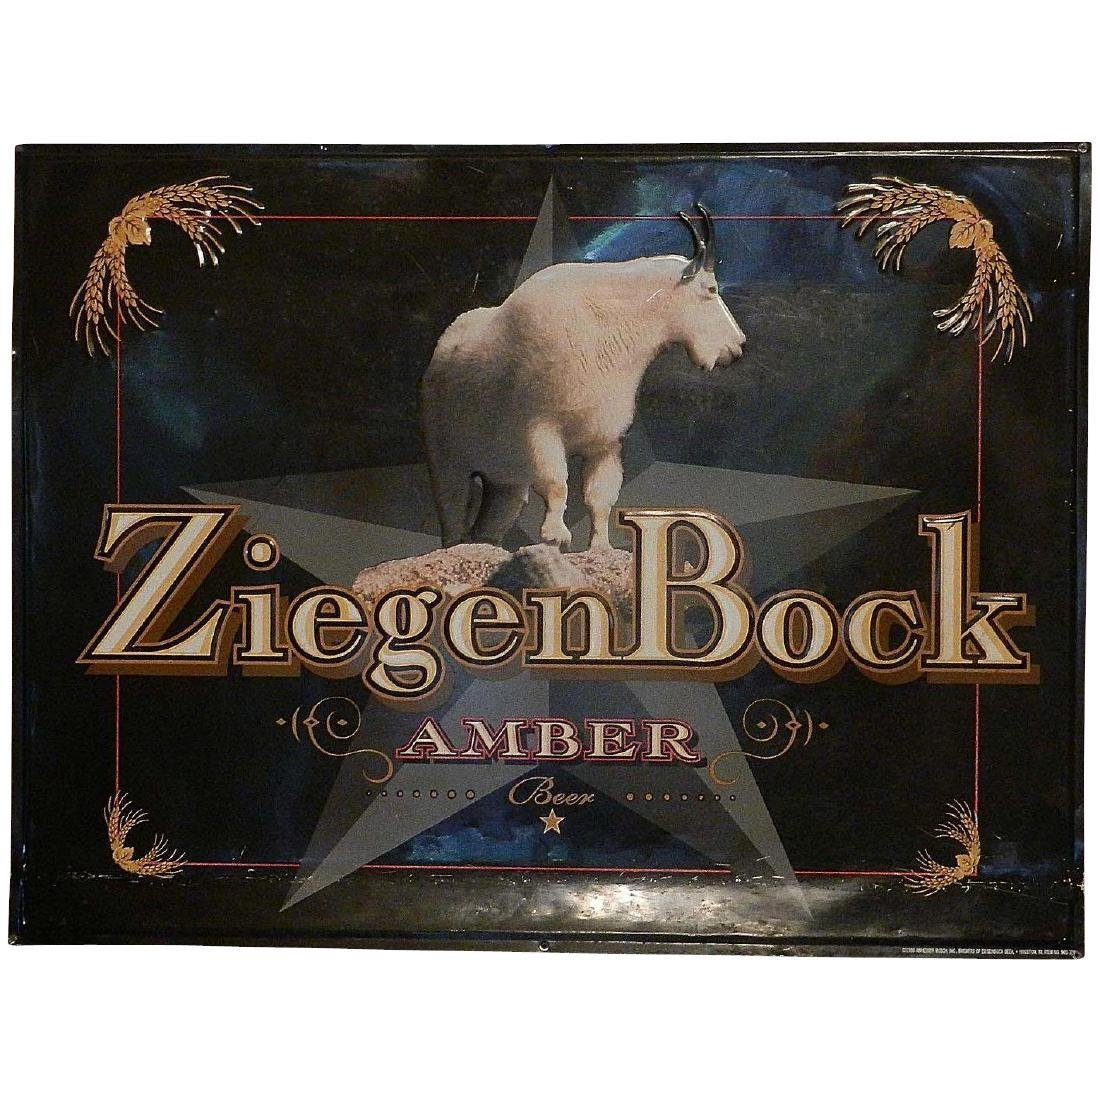 Vintage ZiegenBock Amber Tin Advertising Sign